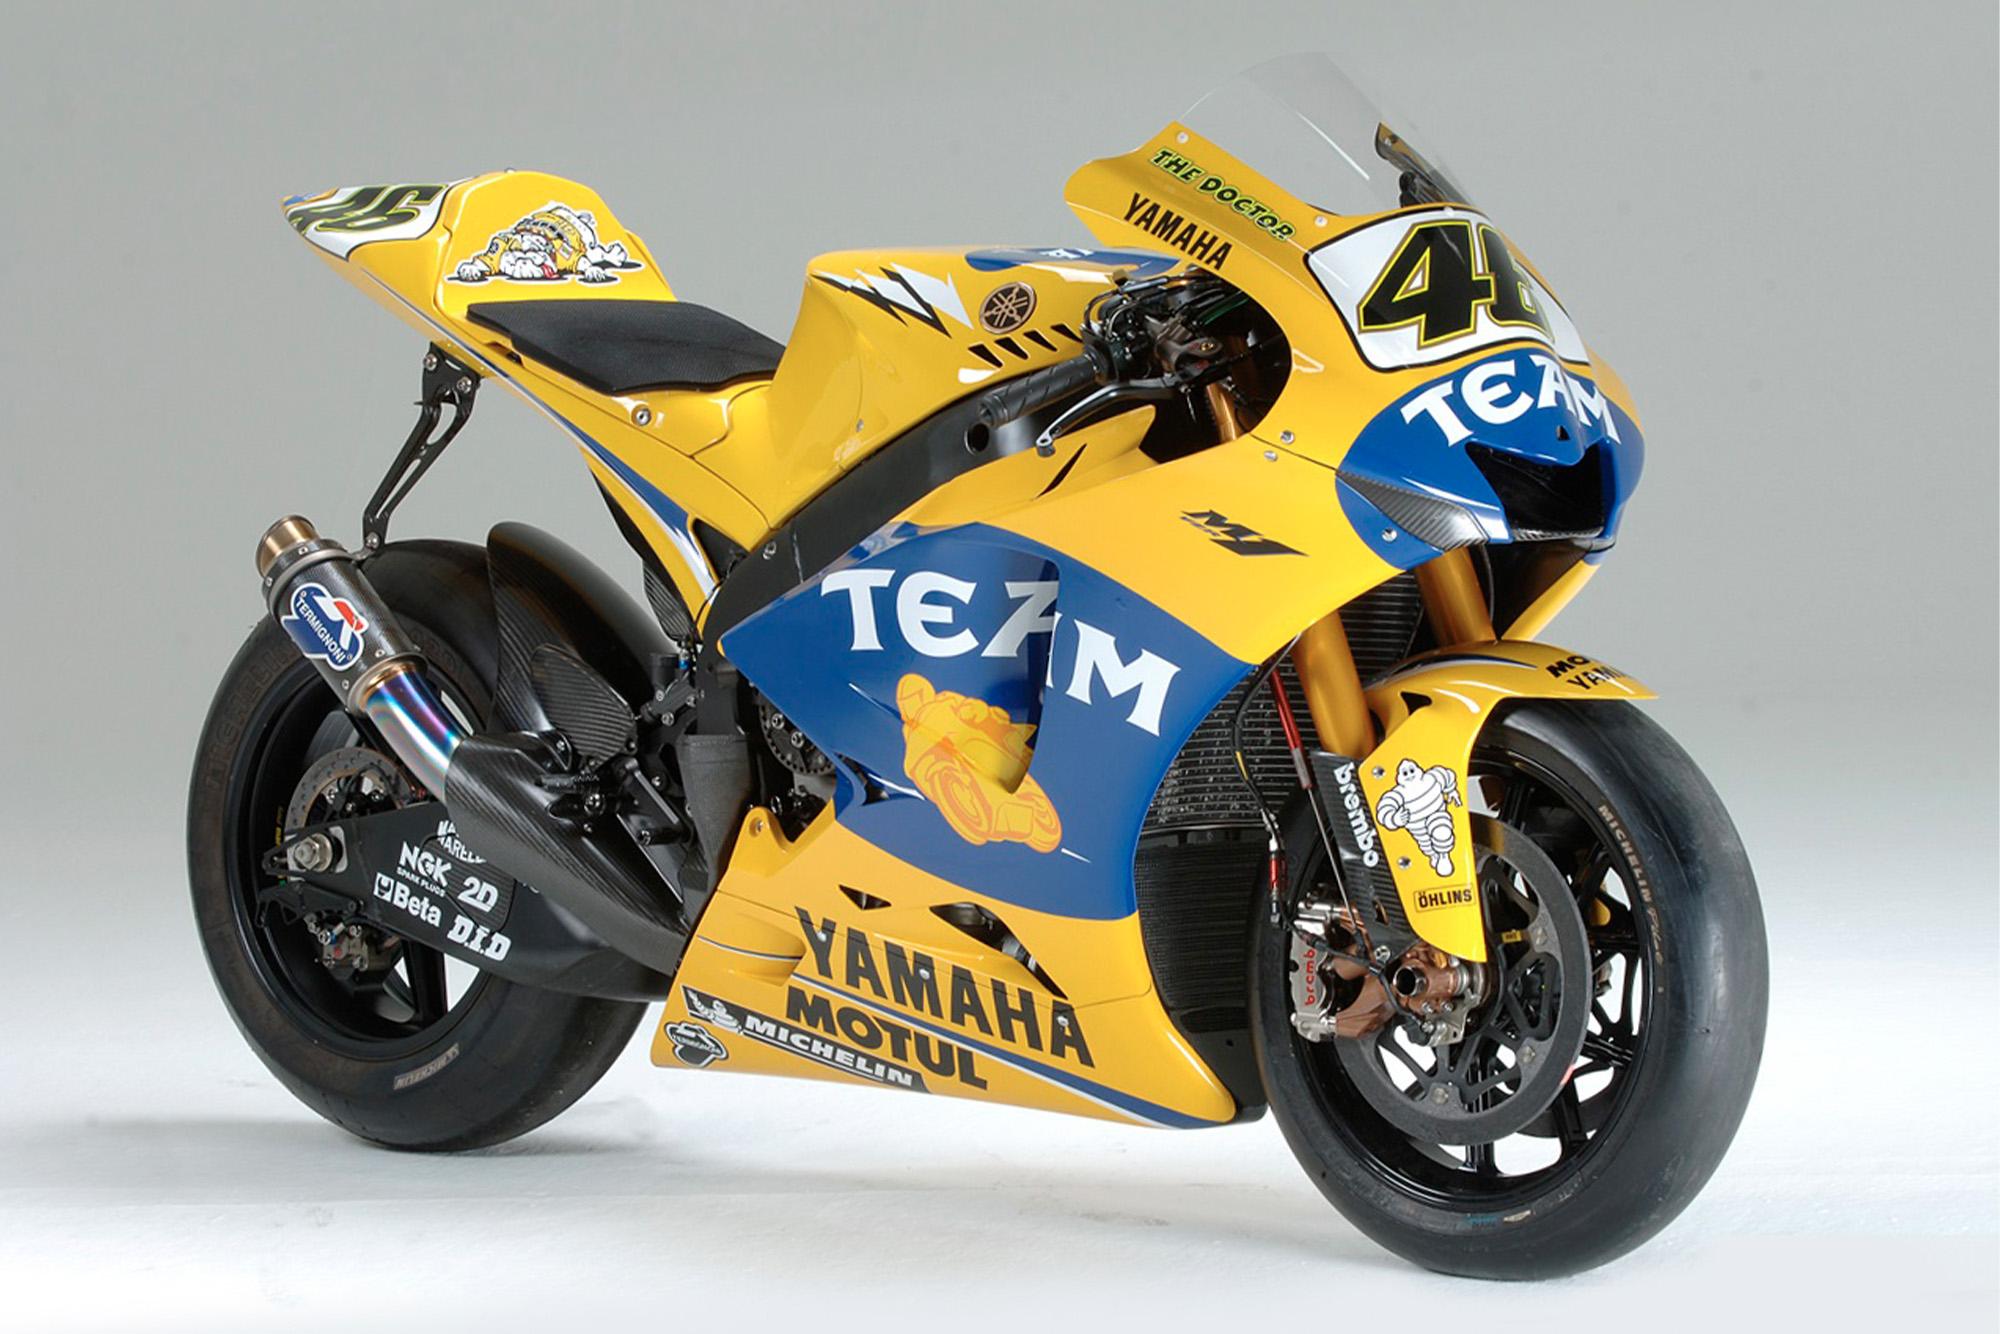 Yamaha 2006 YZR-M1